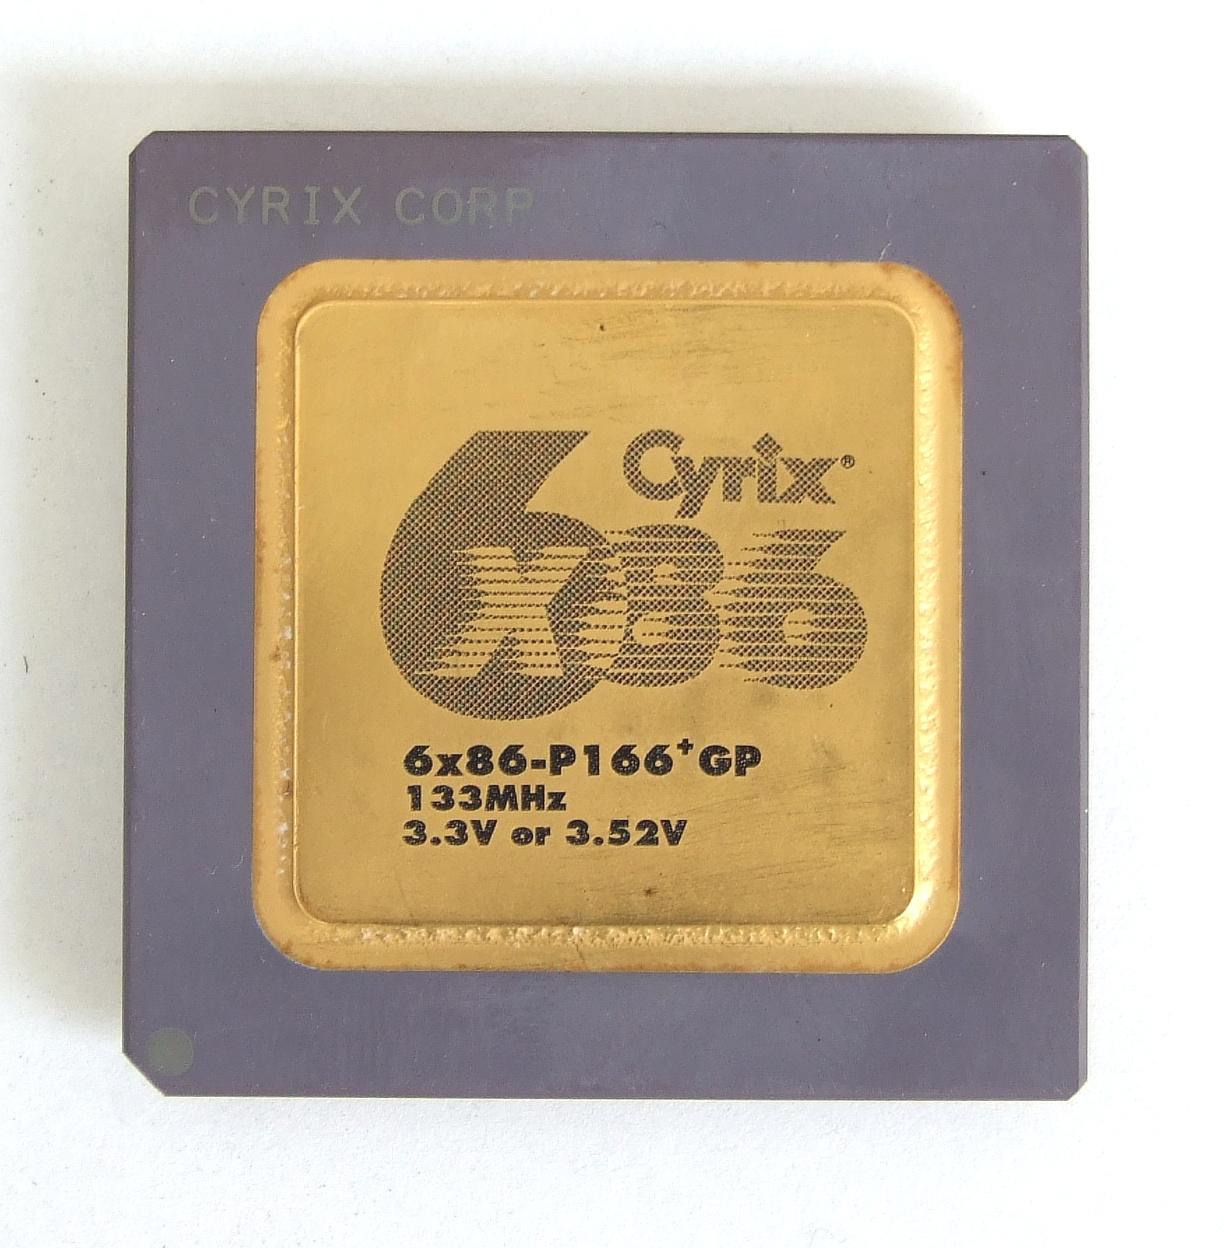 cyrix procesory historia